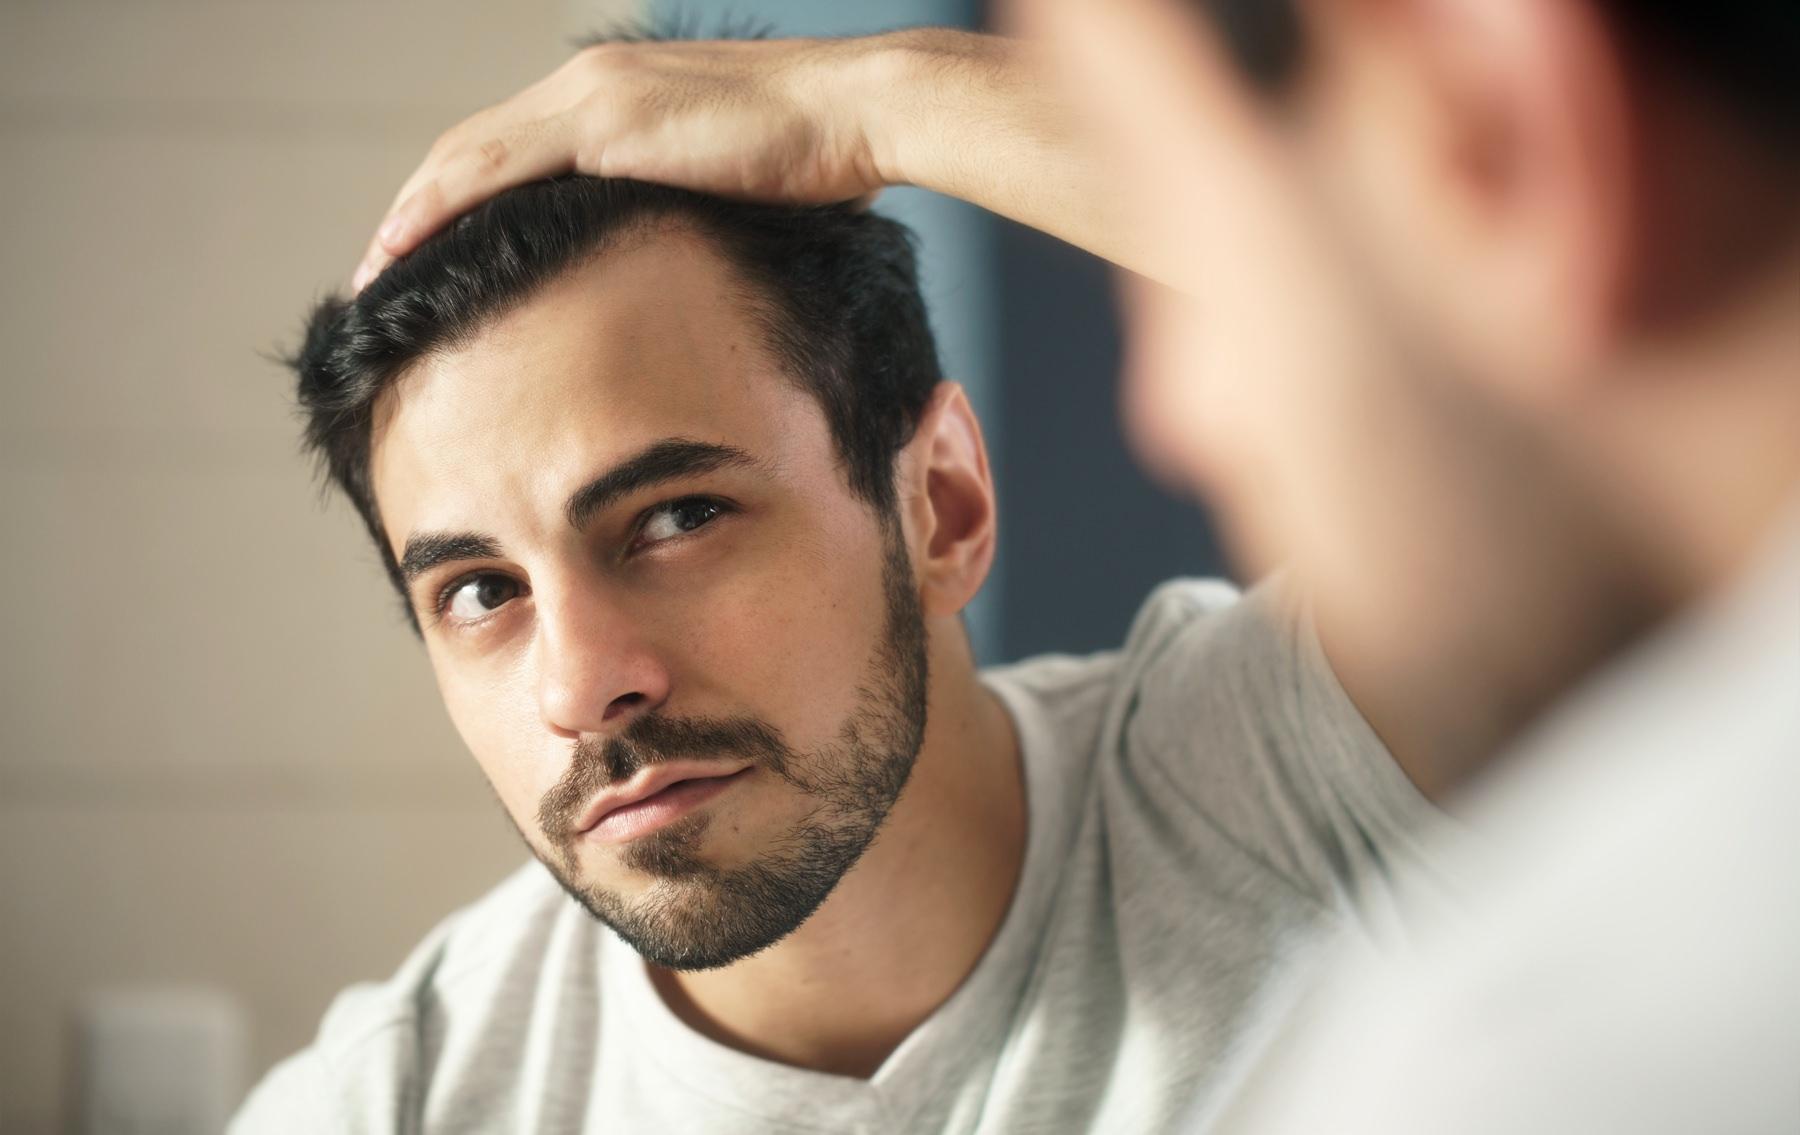 Most popular hair myths debunked